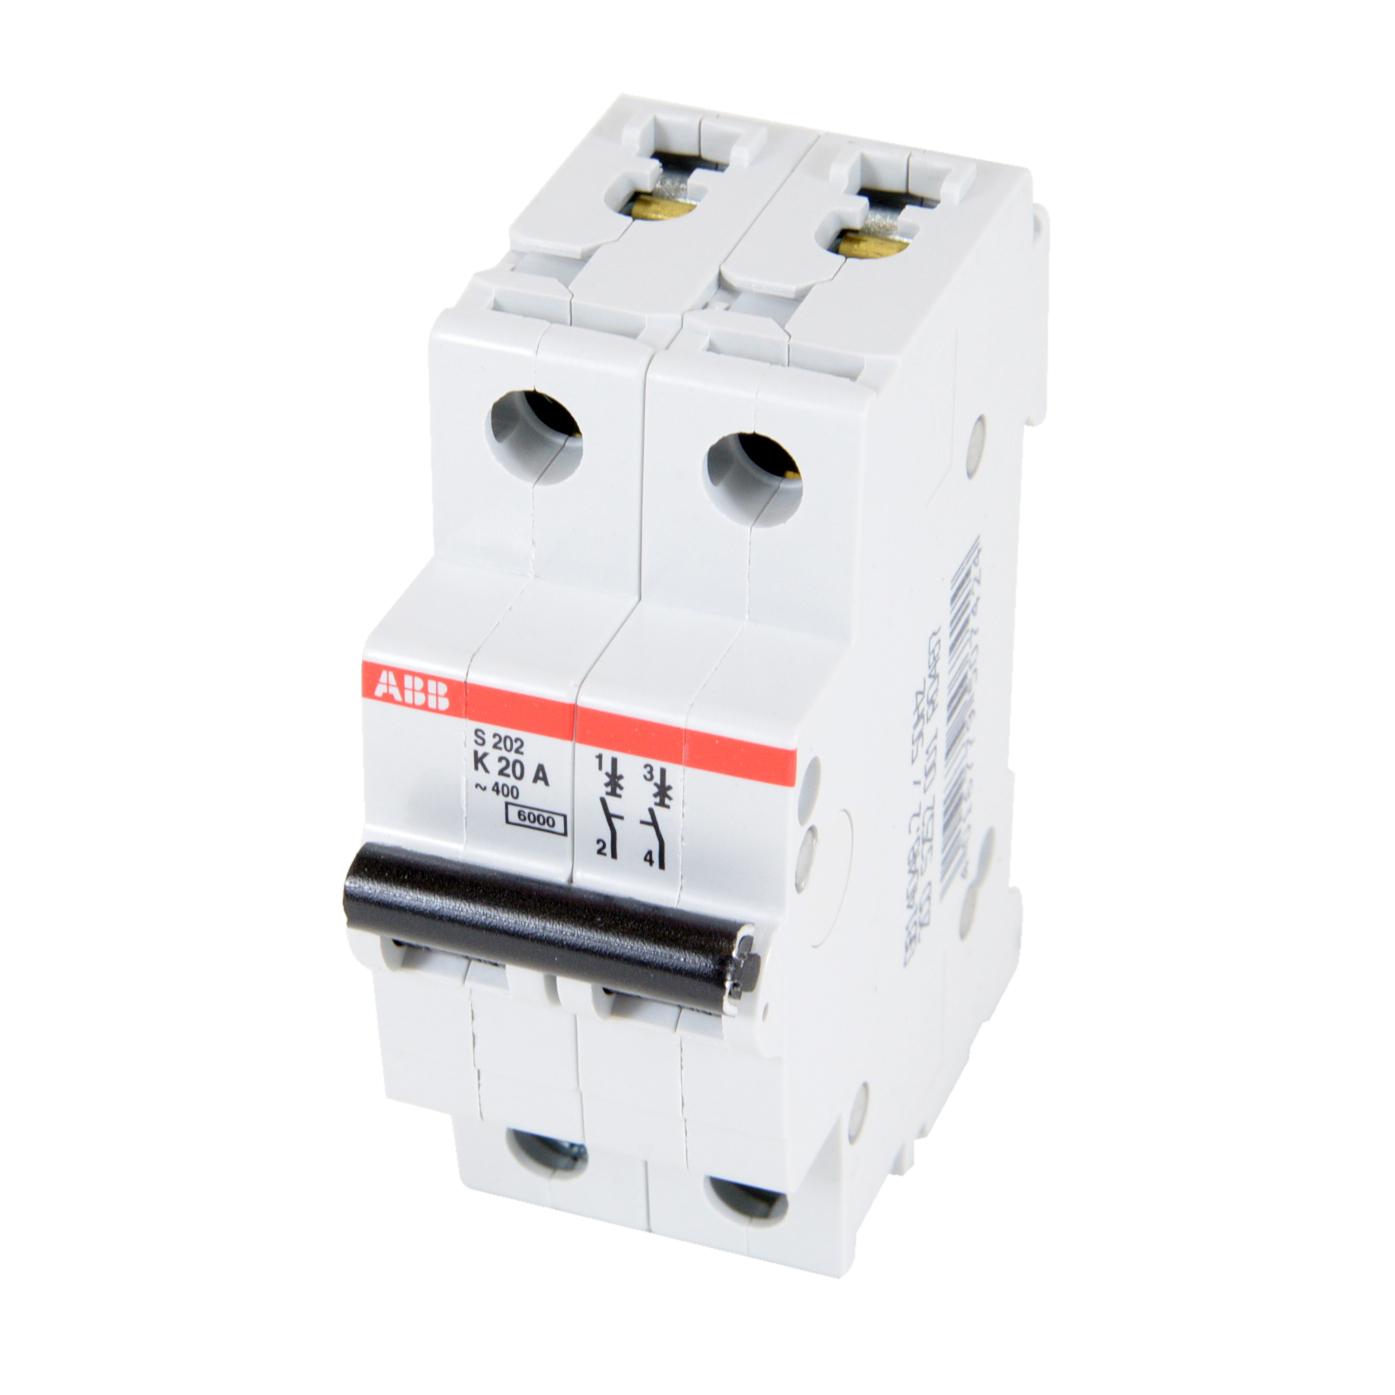 ABB,S202-K20,ABB S200 Miniature Circuit Breaker, 277/480 VAC, 20 A, 6 kA Interrupt, 2 Poles, Thermal Magnetic Trip